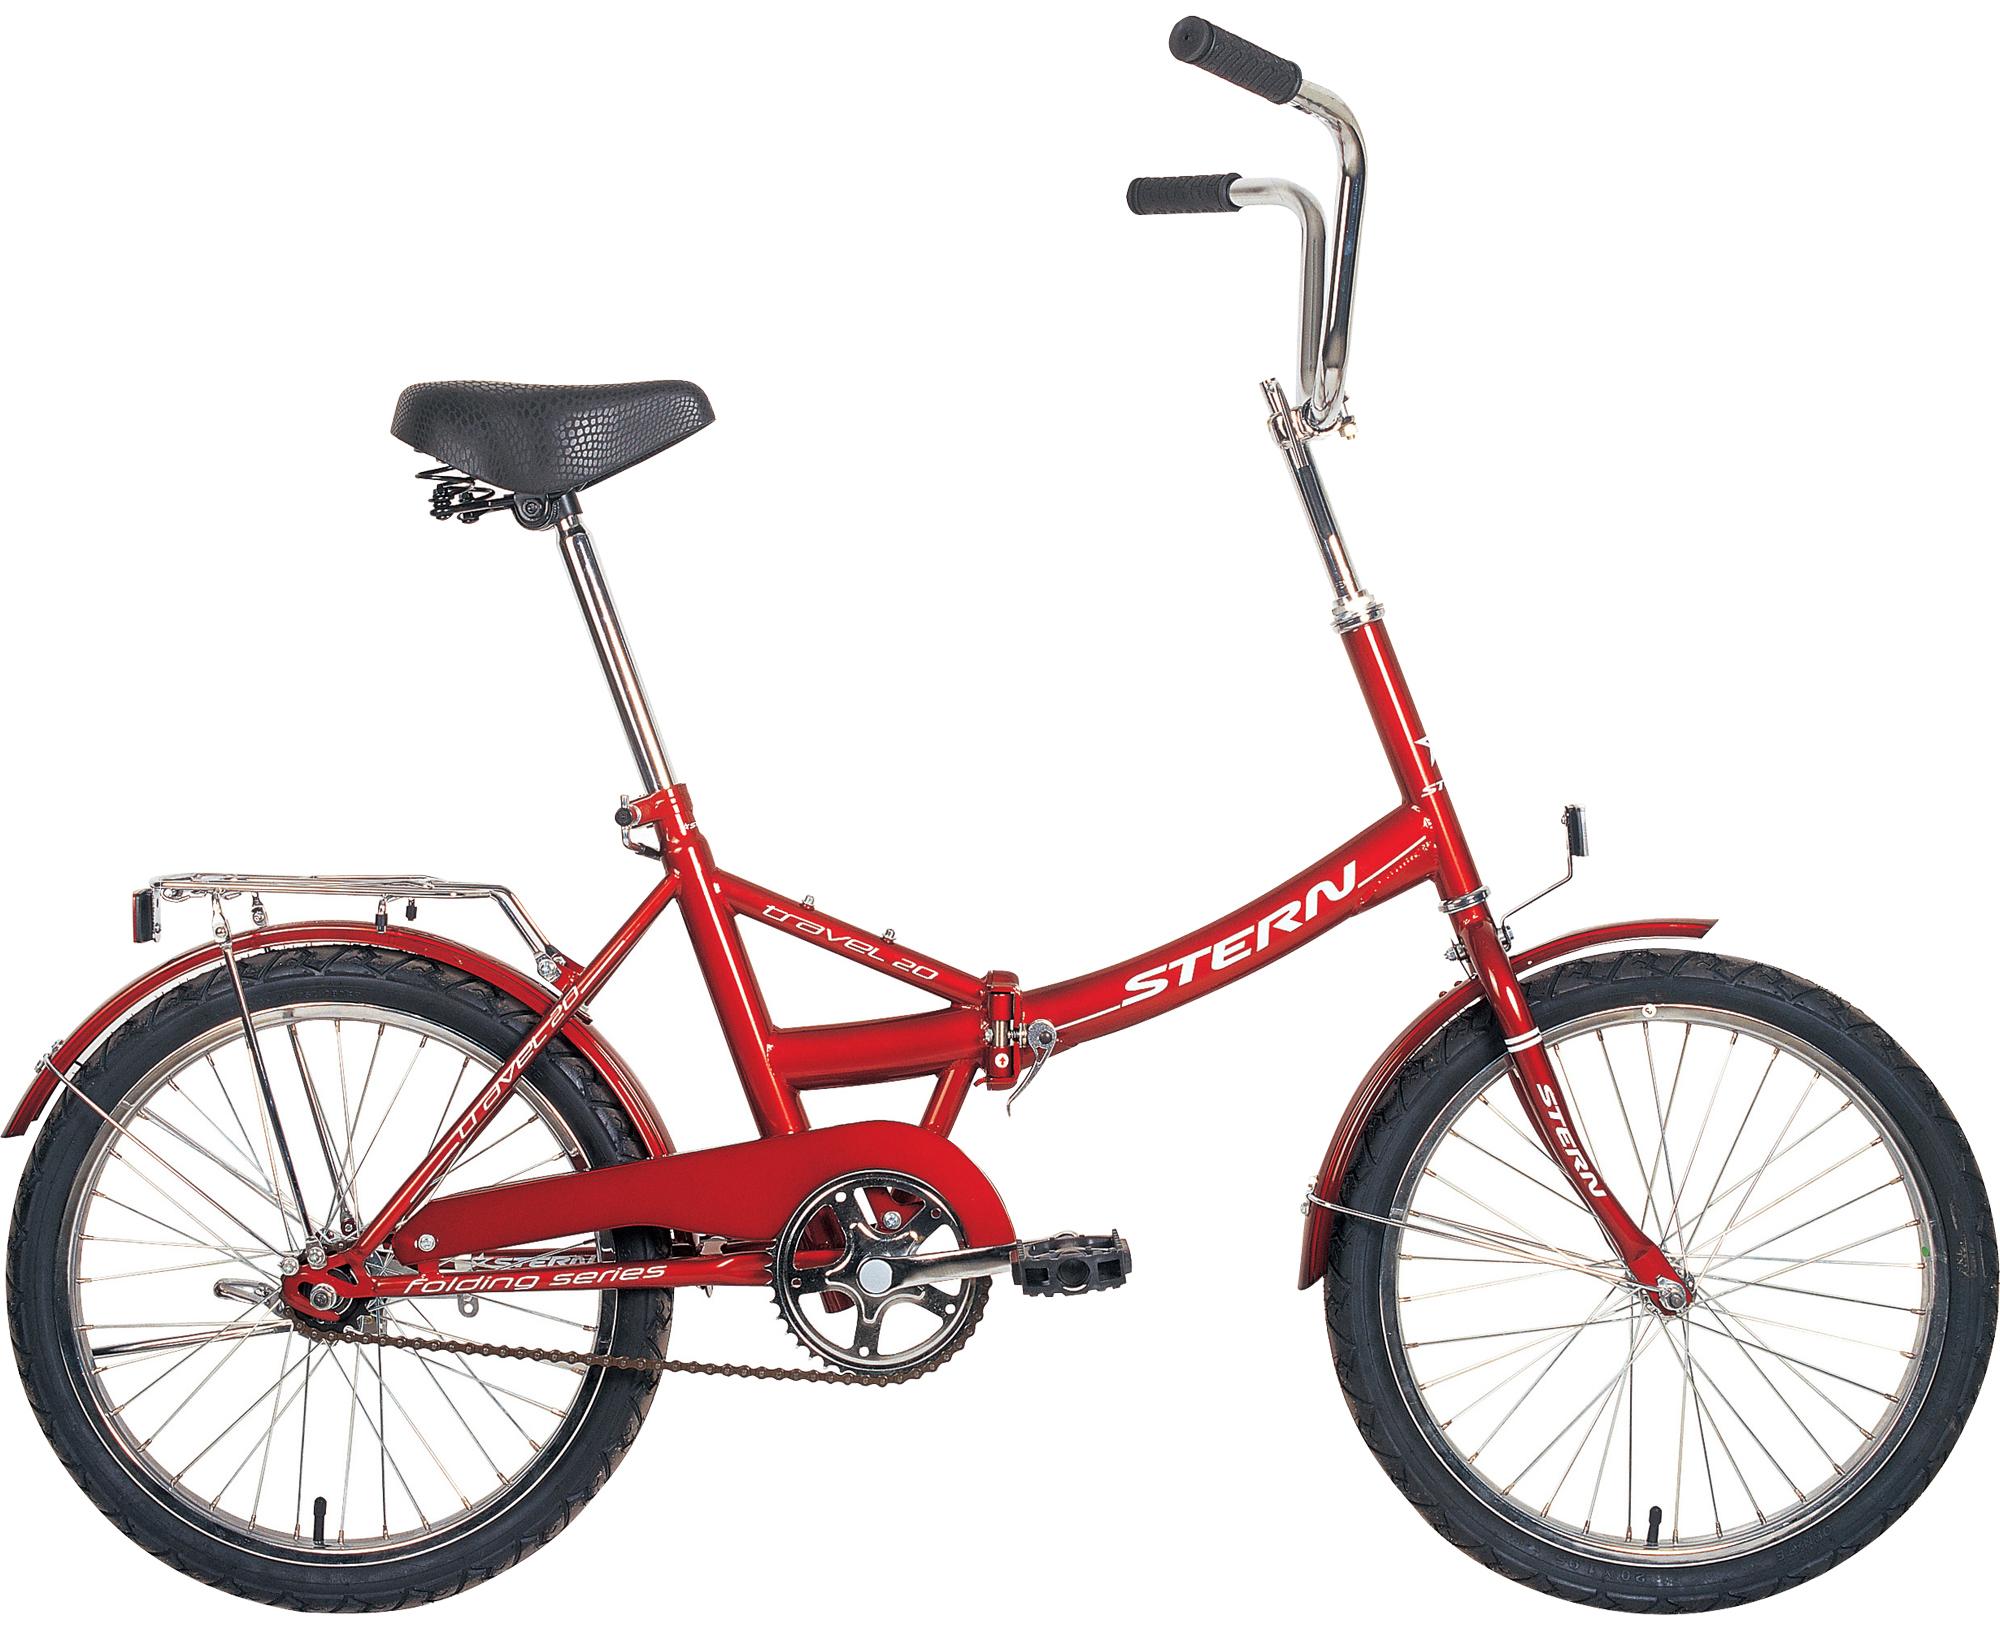 Stern Stern Travel 20 (2017) stern велосипед складной stern compact 2 0 20